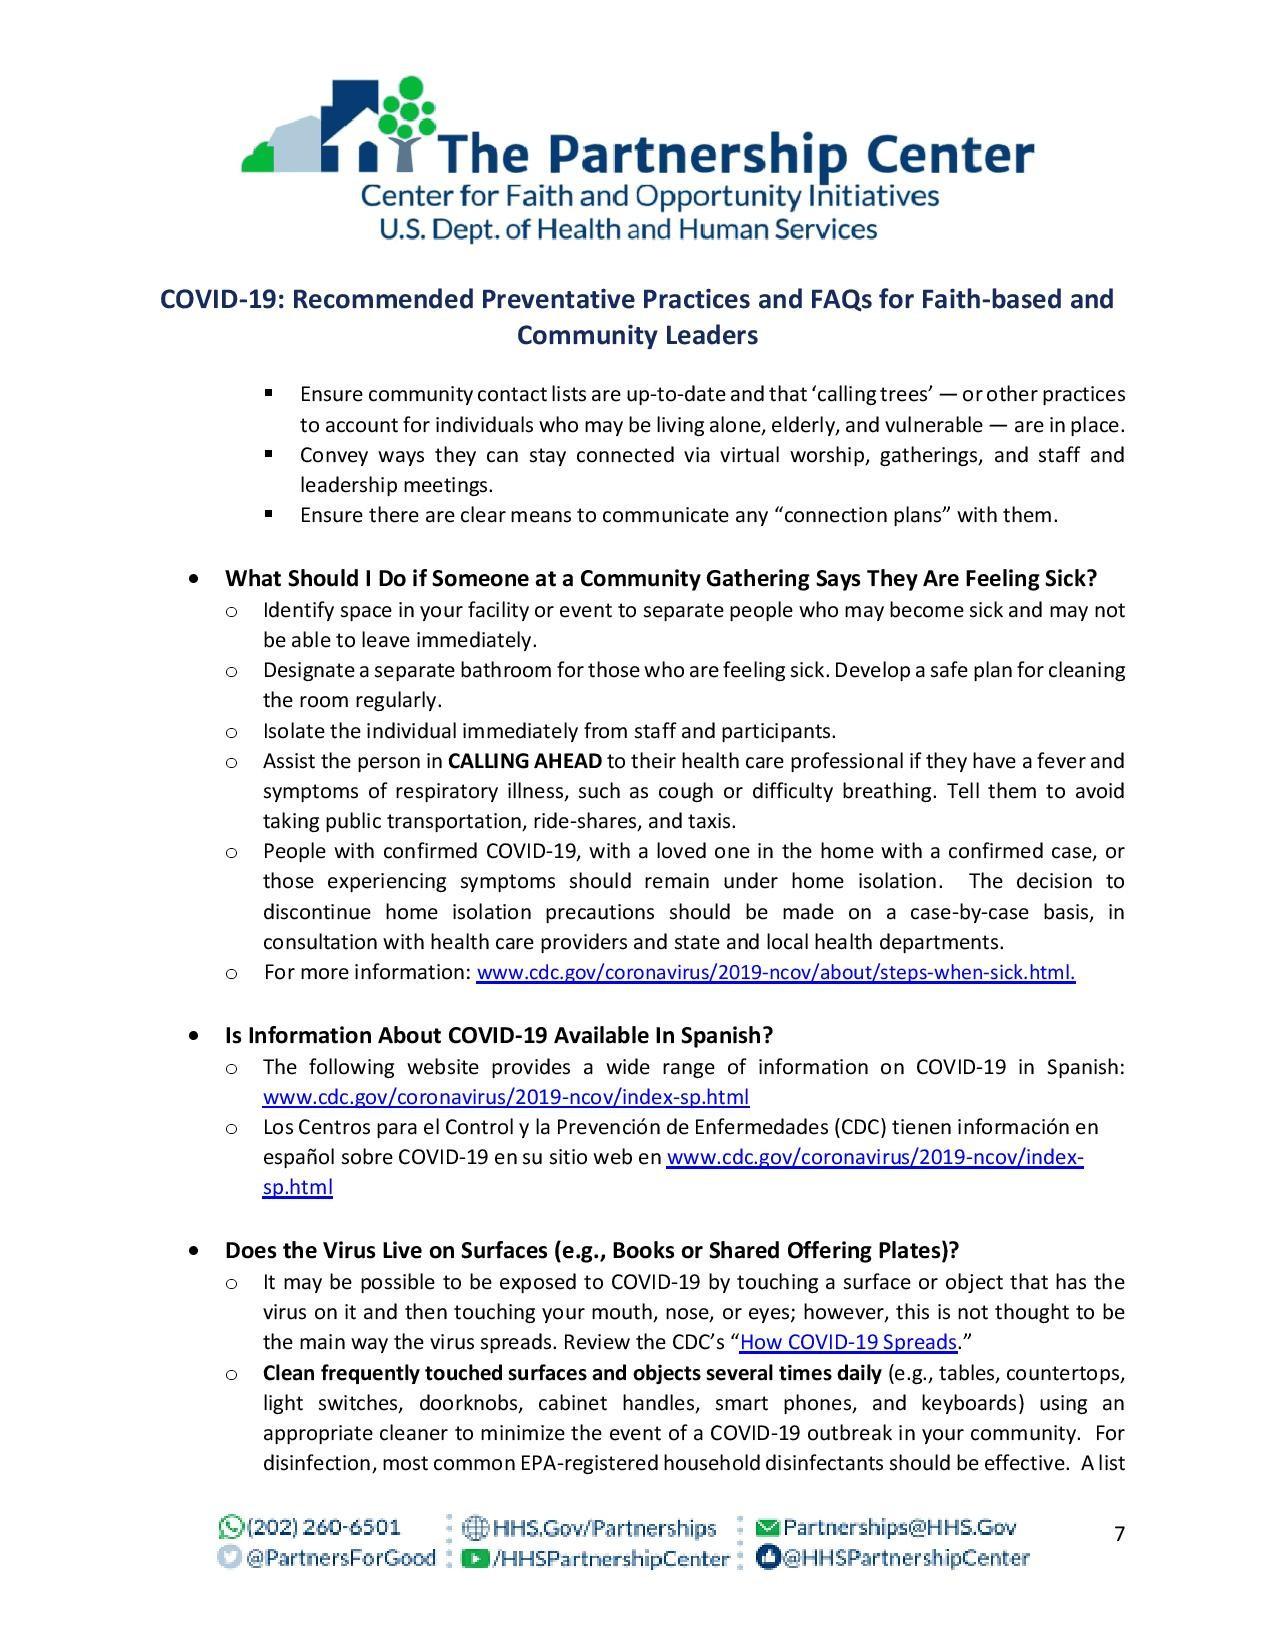 3-17-20-faith-and-community-based-covid-19-faq-page-007